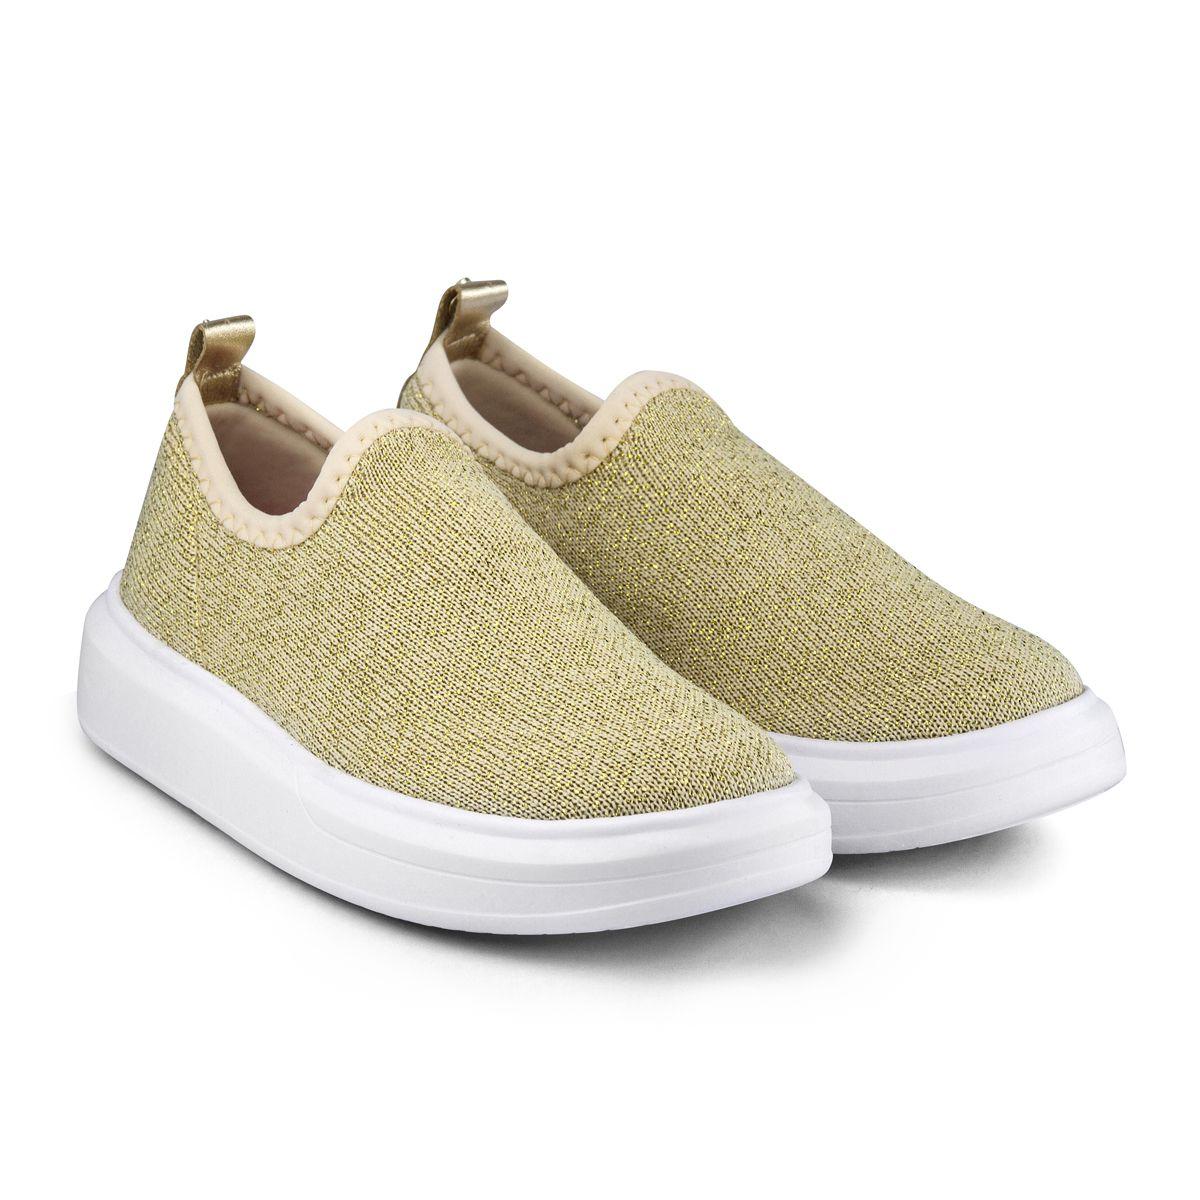 Pantofi sport Bibi Glam, Auriu